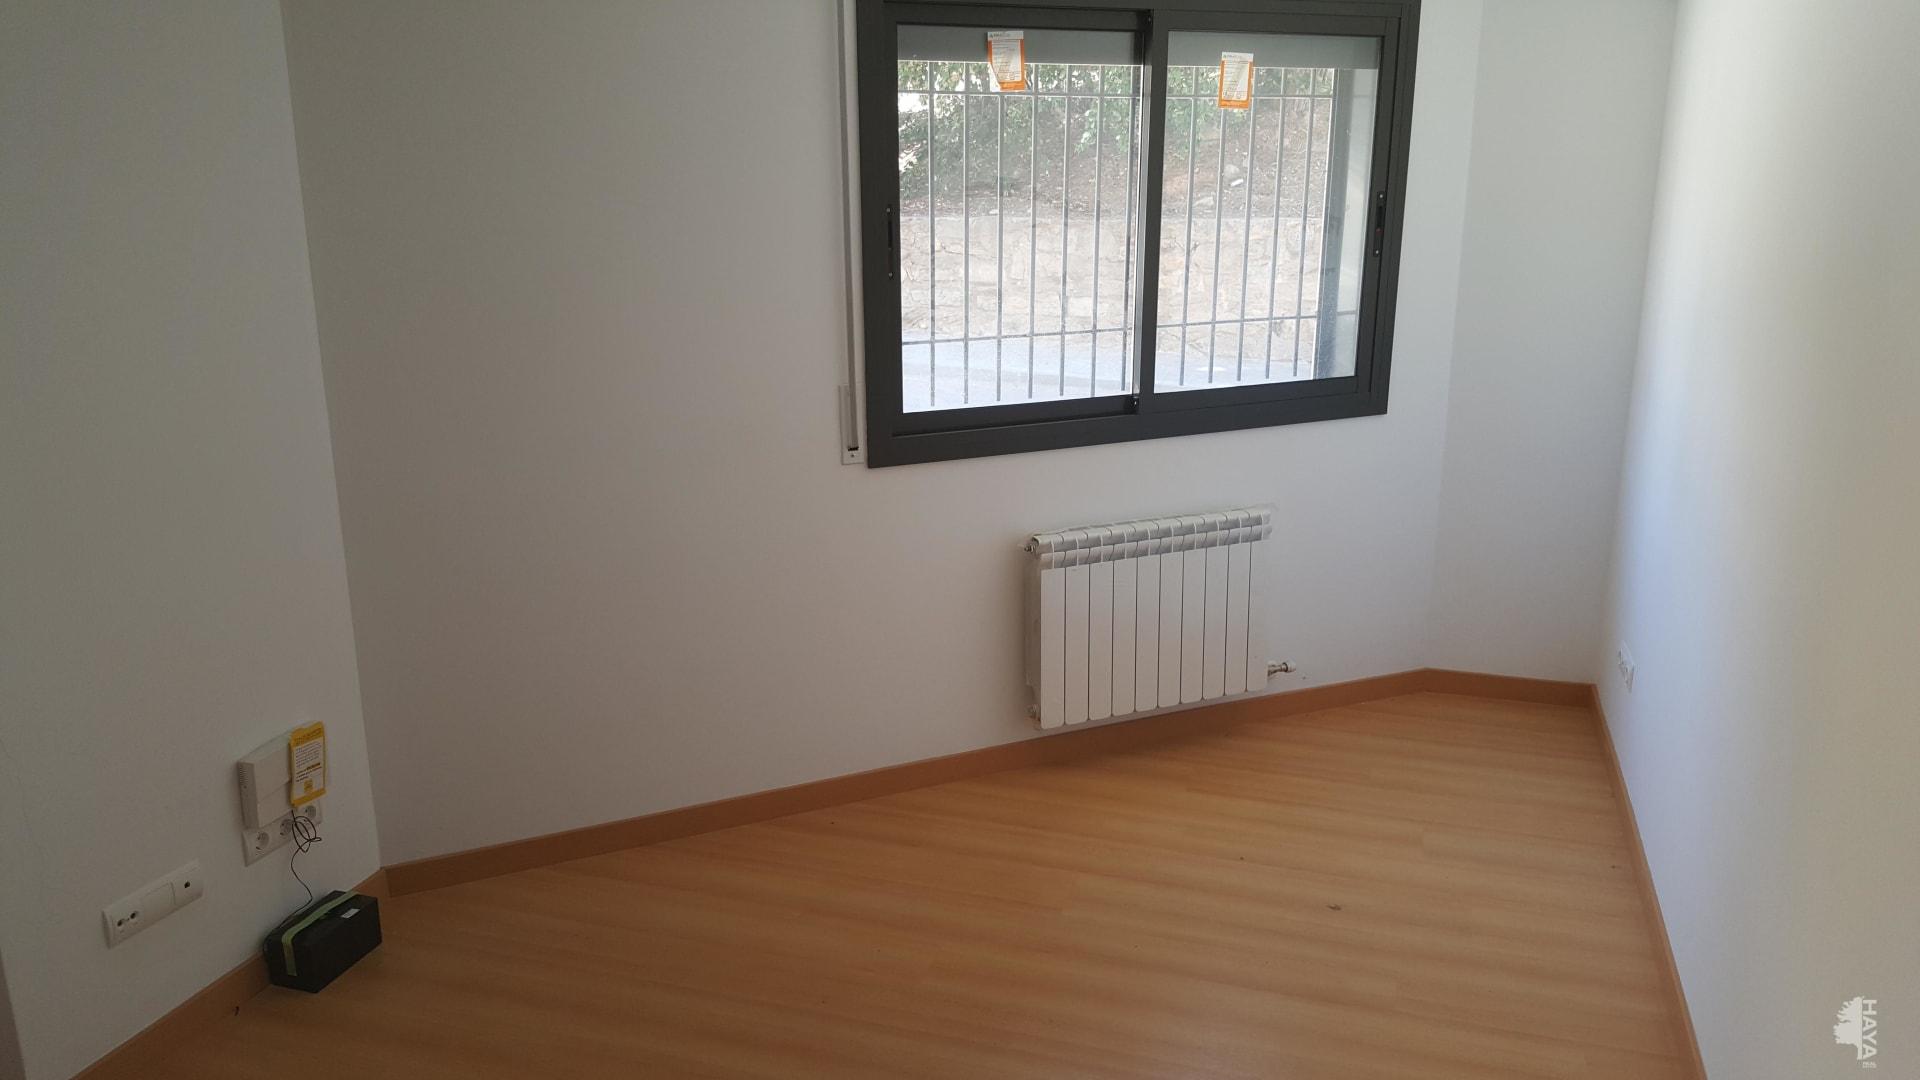 Piso en venta en Puigbò, Sallent, Barcelona, Calle Bisbe Valls, 93.800 €, 3 habitaciones, 1 baño, 77 m2